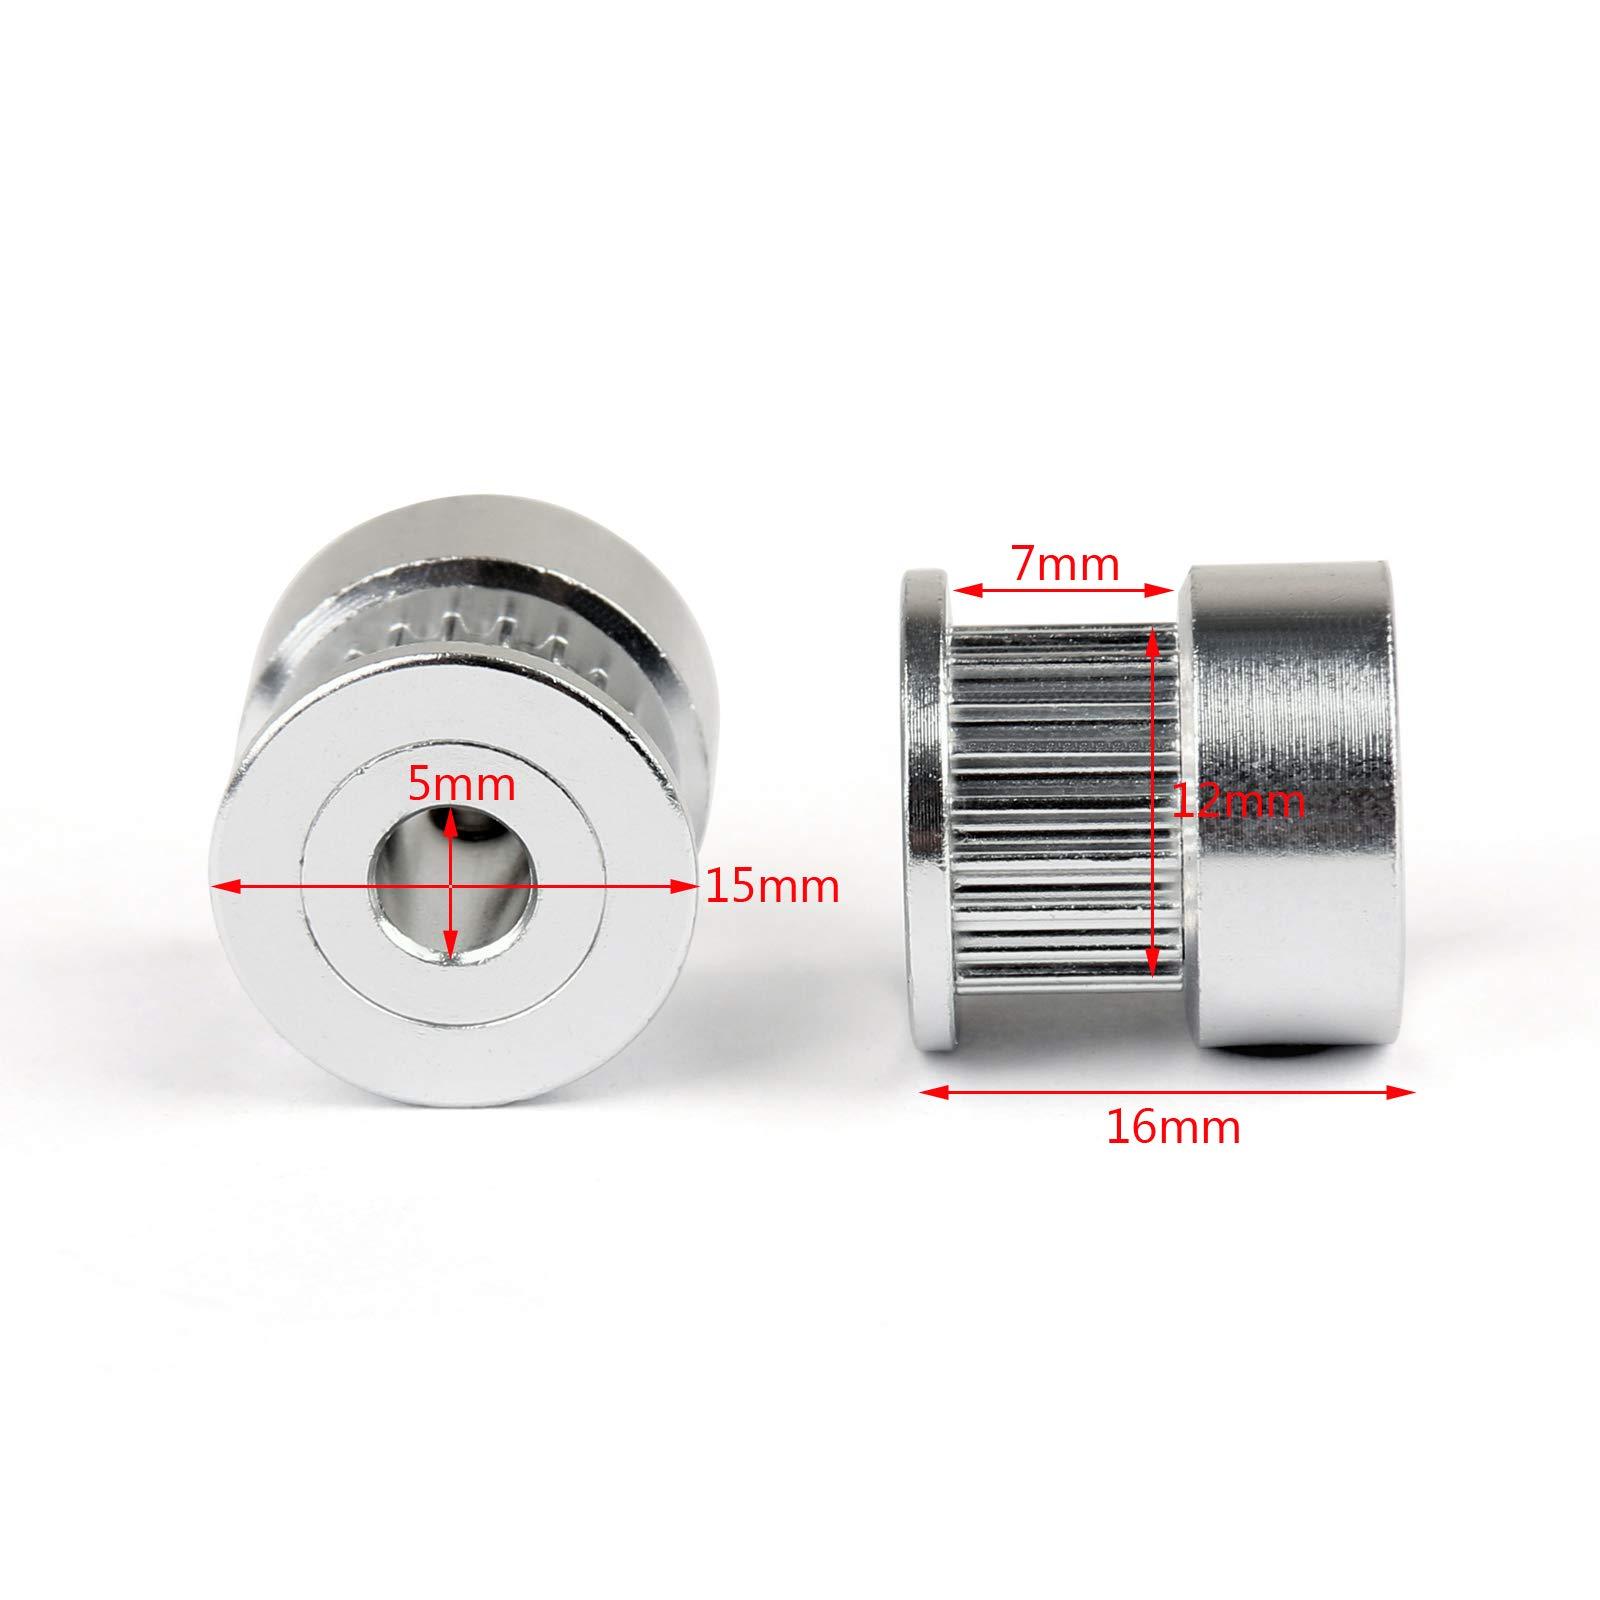 Areyourshop 20Pcs GT2 20T 5mm Bore Aluminum Timing Belt Pulley for 3D Printer Parts